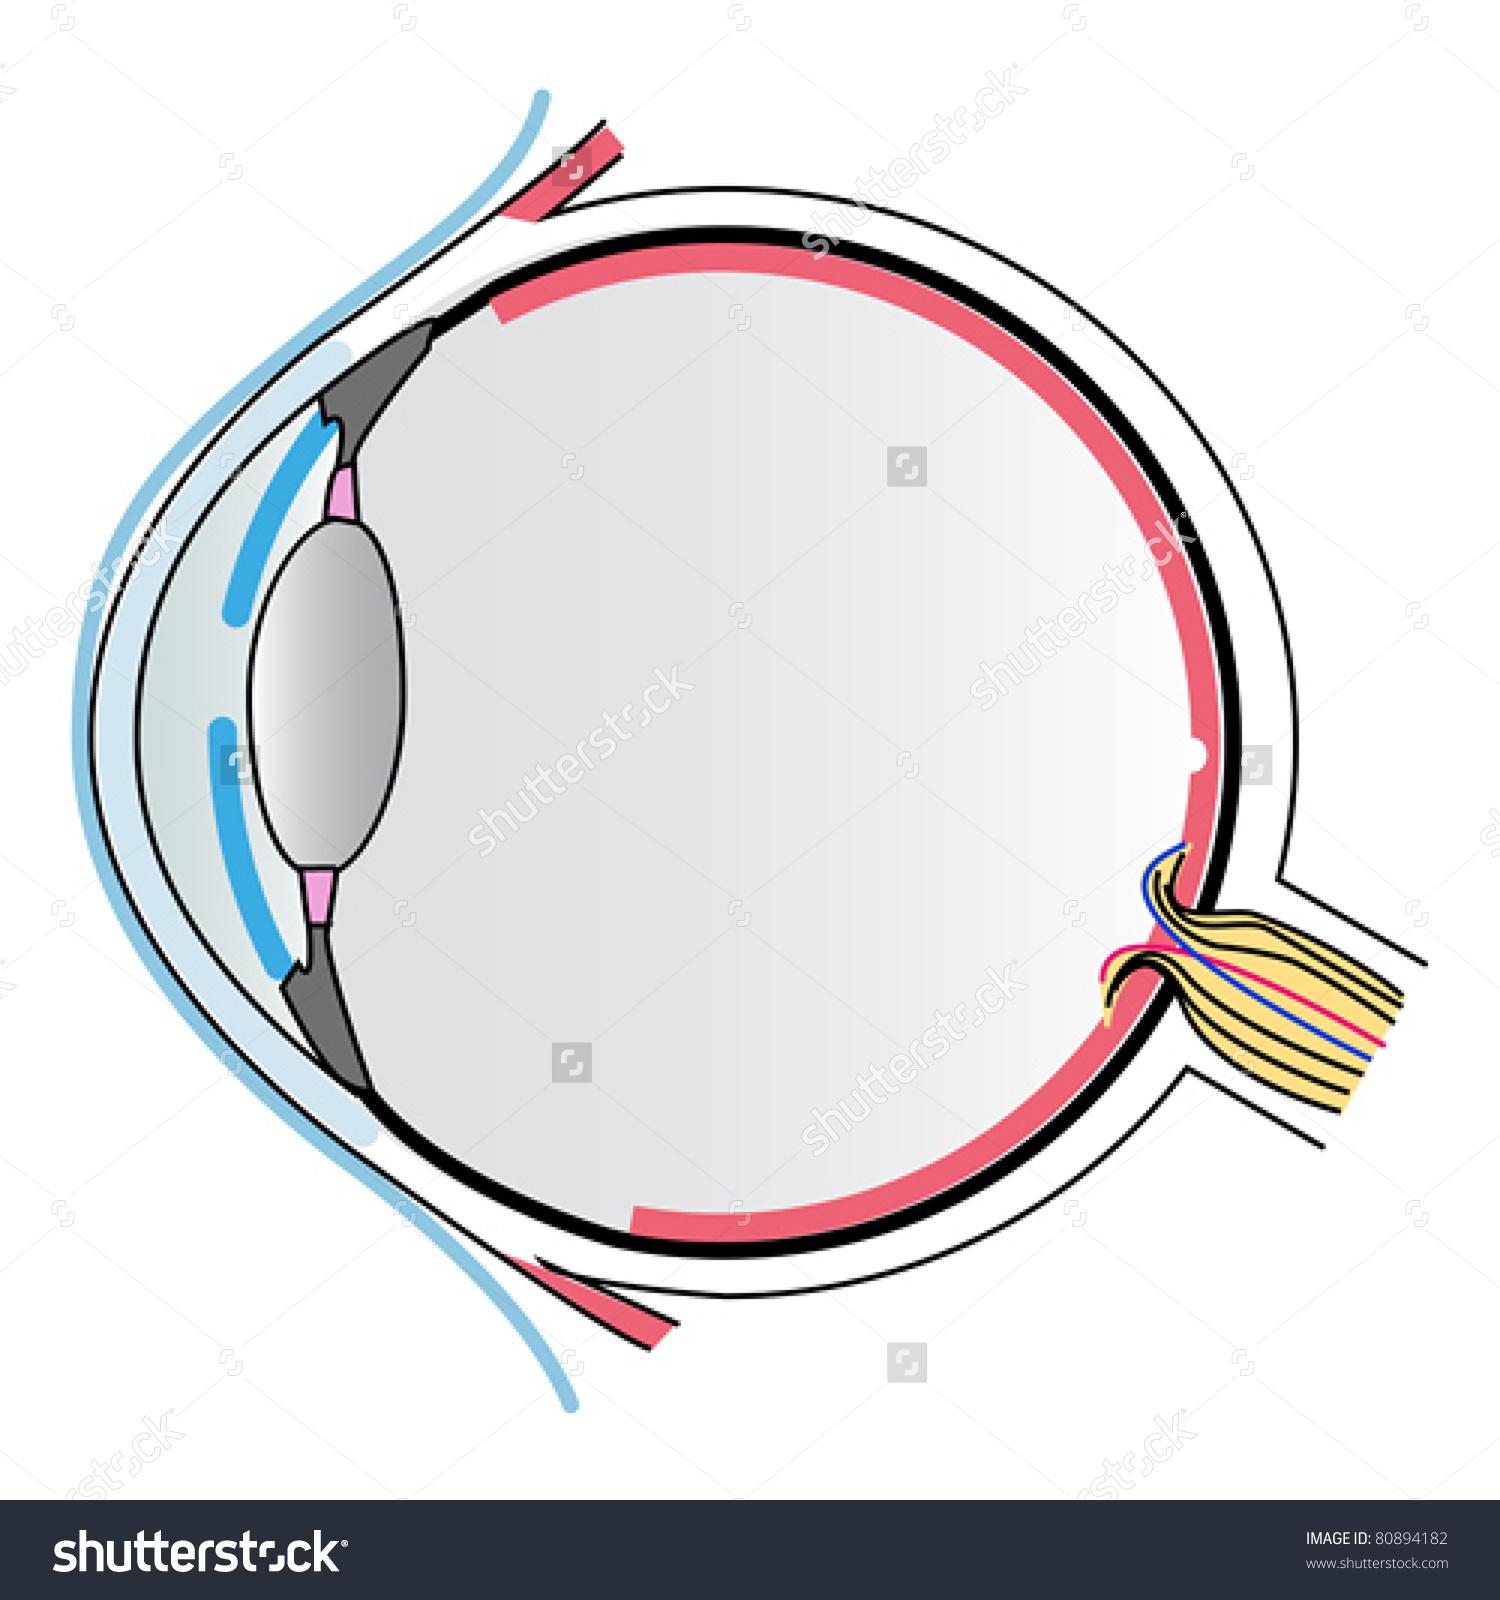 eyes anatomy clipart - Clipground